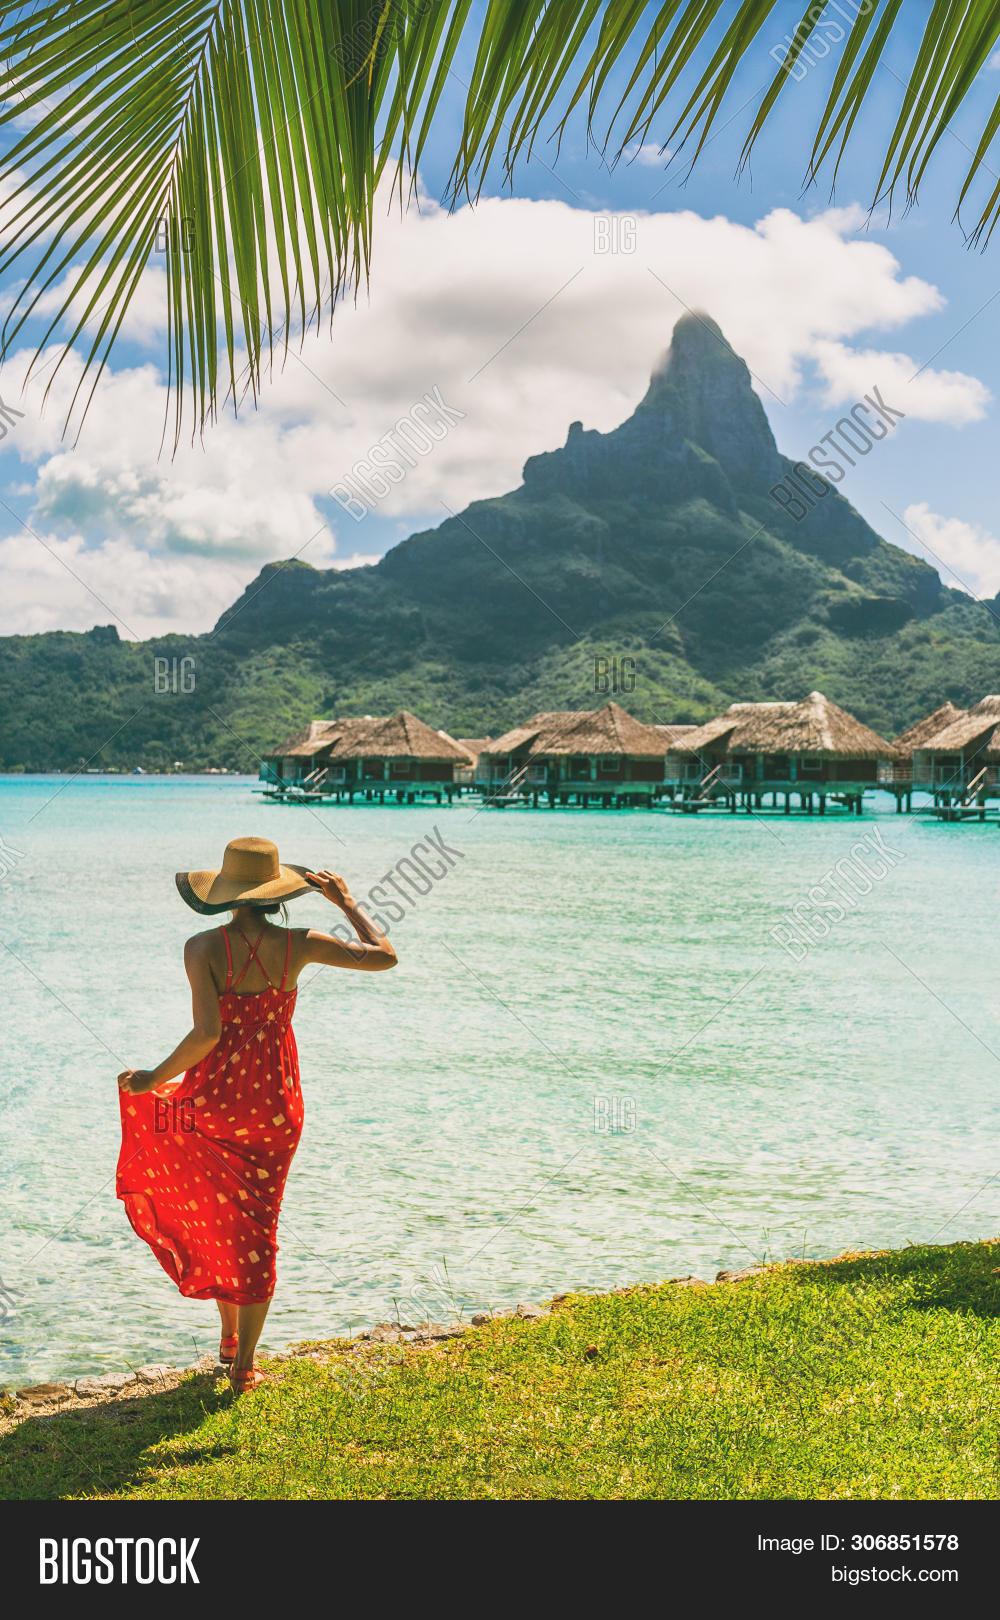 Tahiti Resort Travel Image Photo Free Trial Bigstock